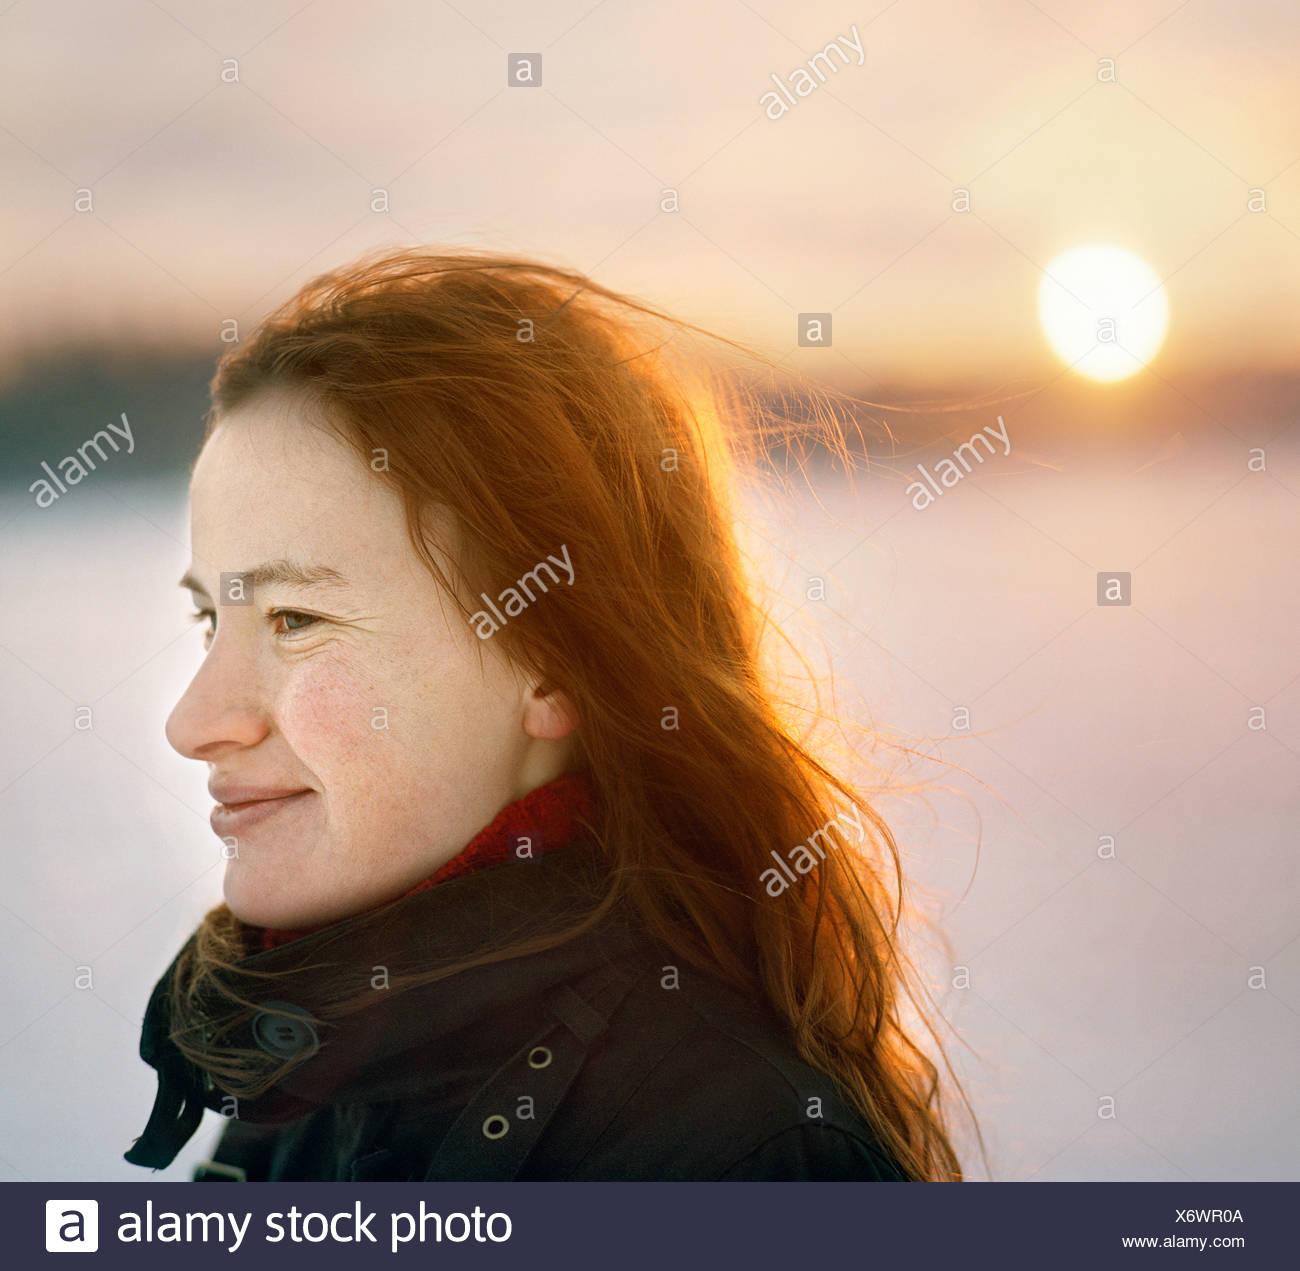 Nahaufnahme einer jungen Frau, Lächeln Stockbild